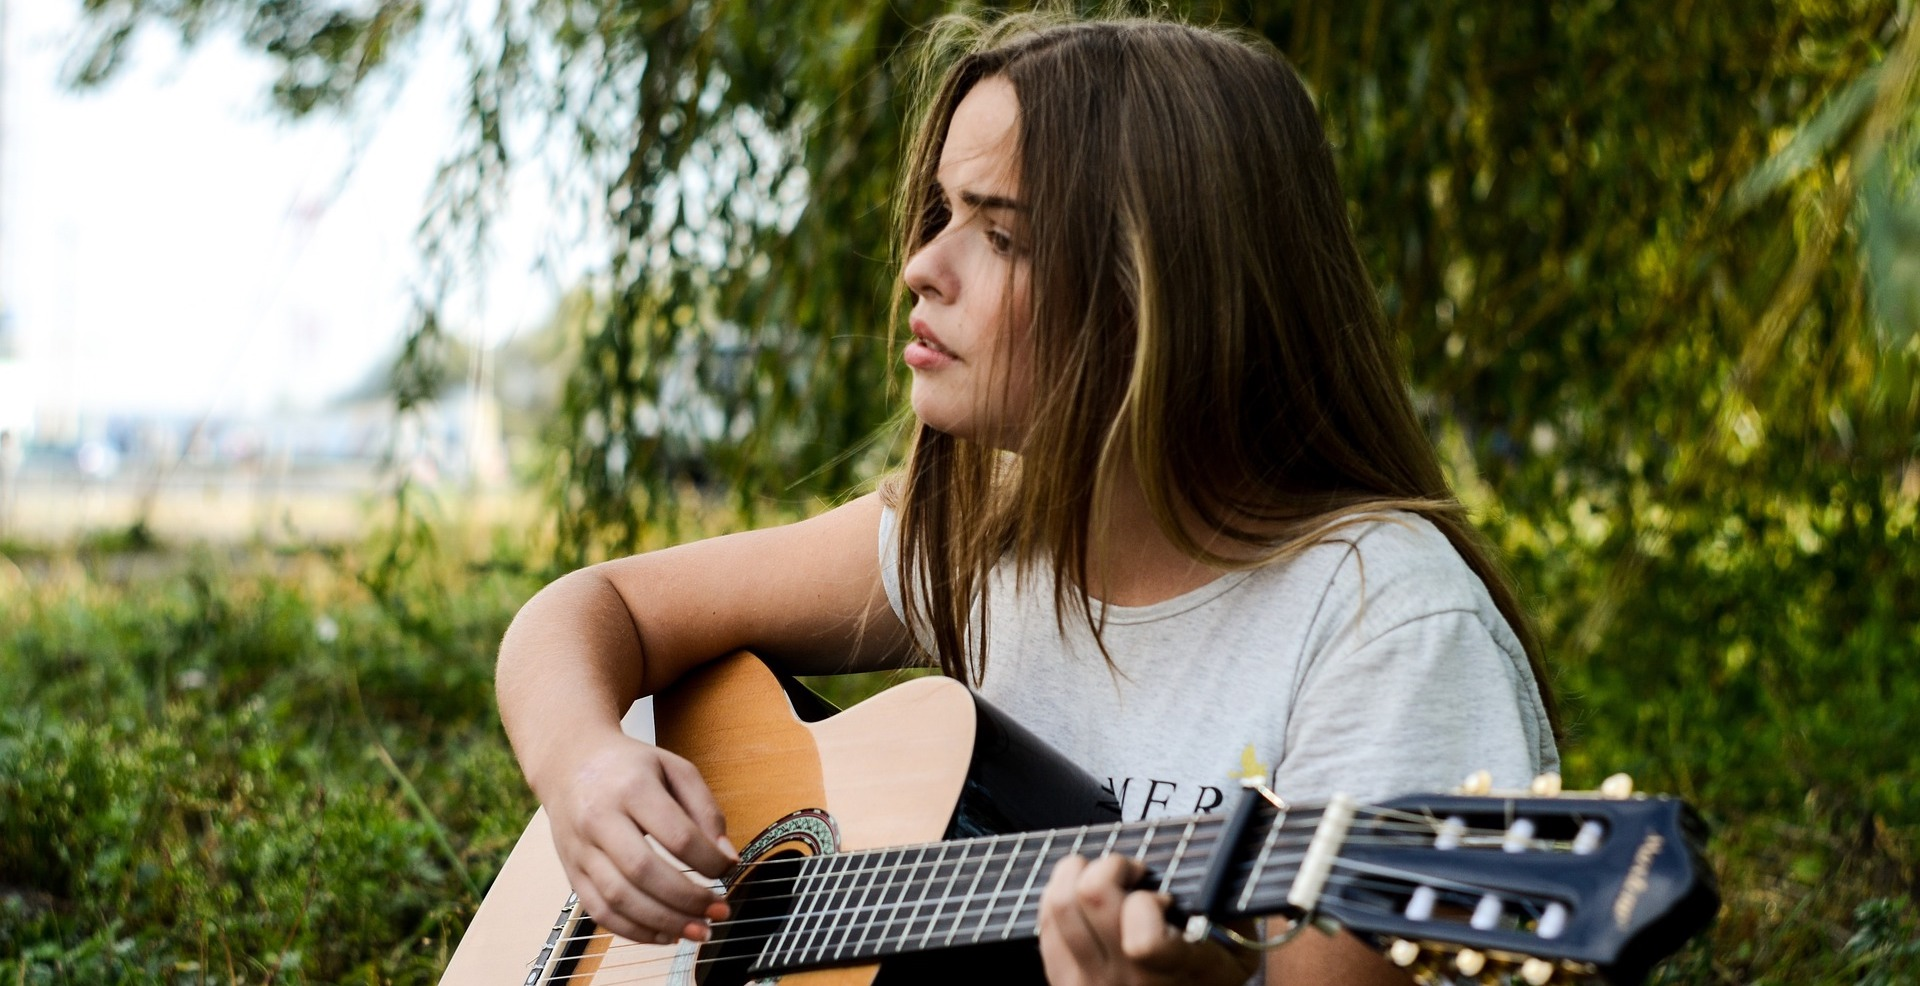 Inspired guitar